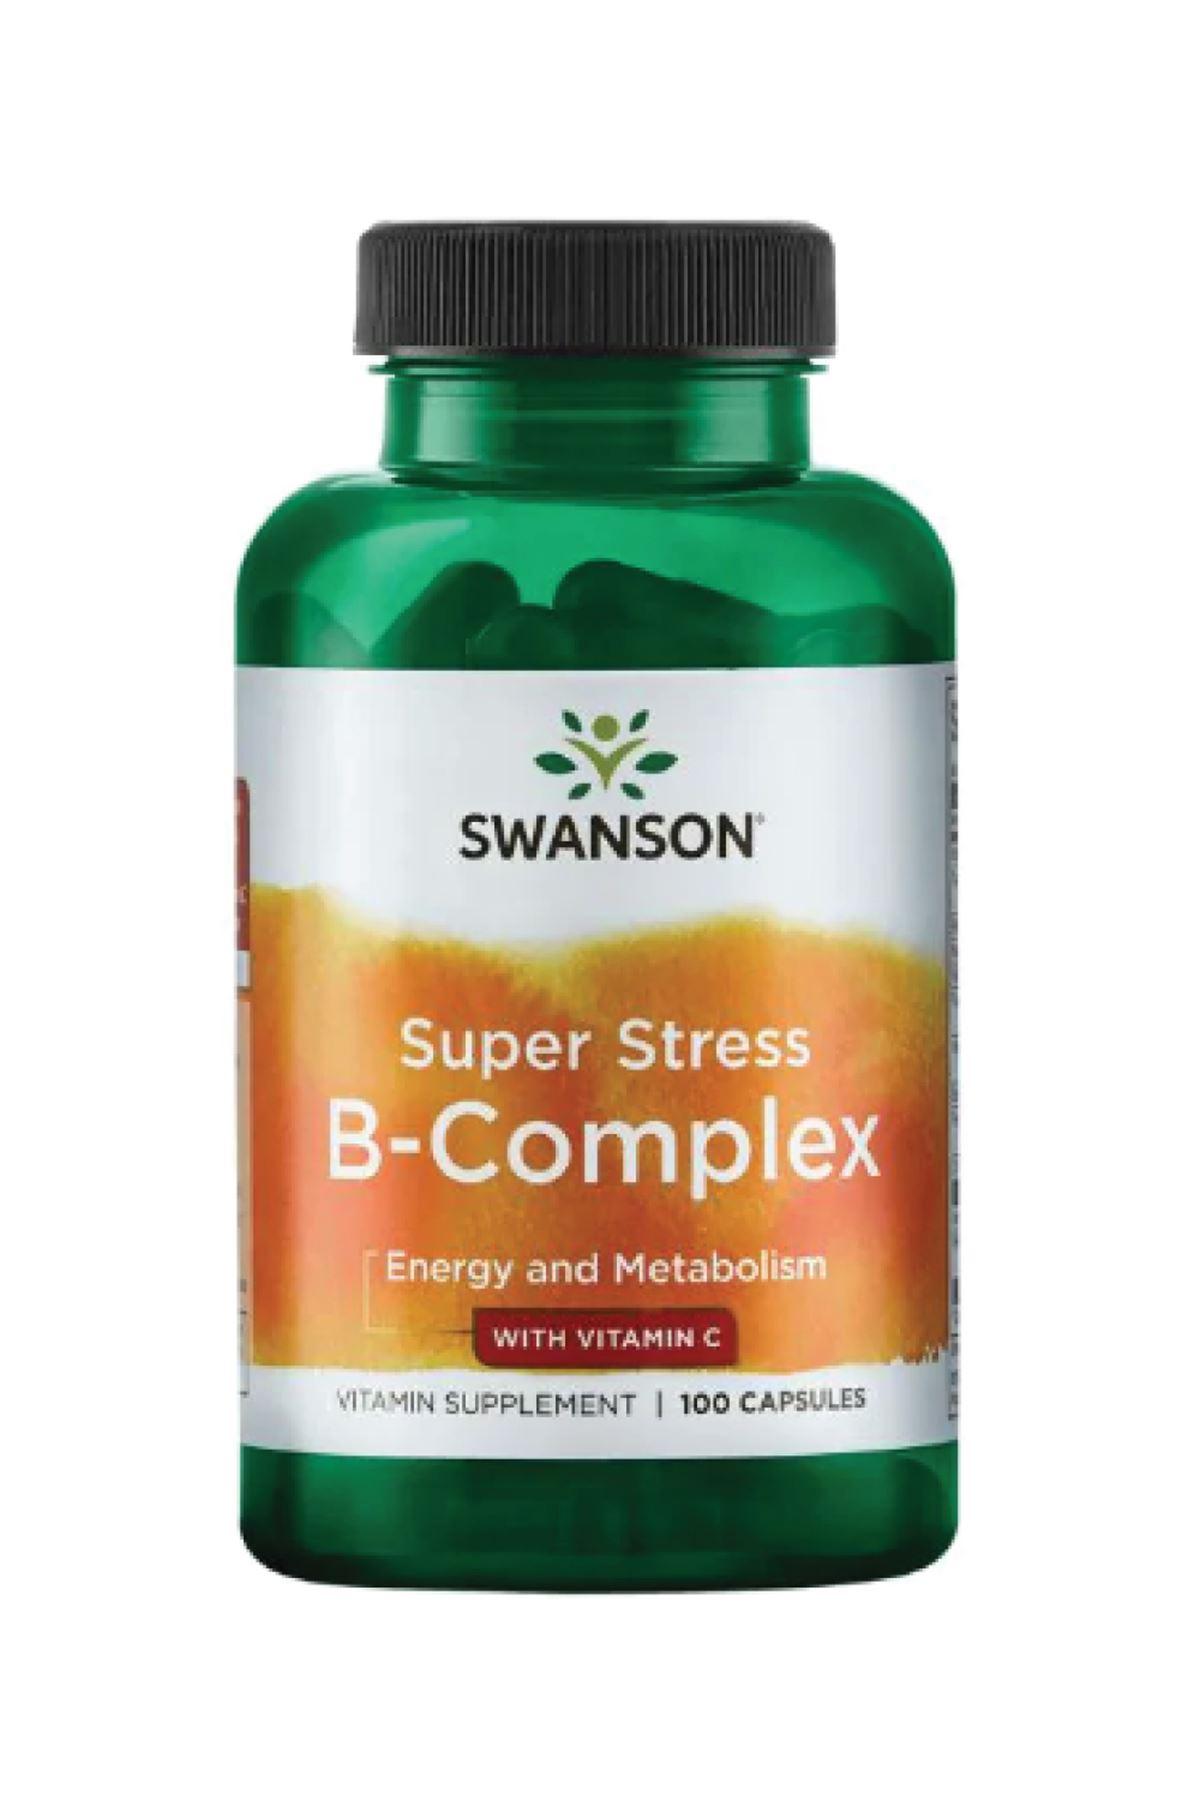 Super Stress B-Complex with Vitamin C